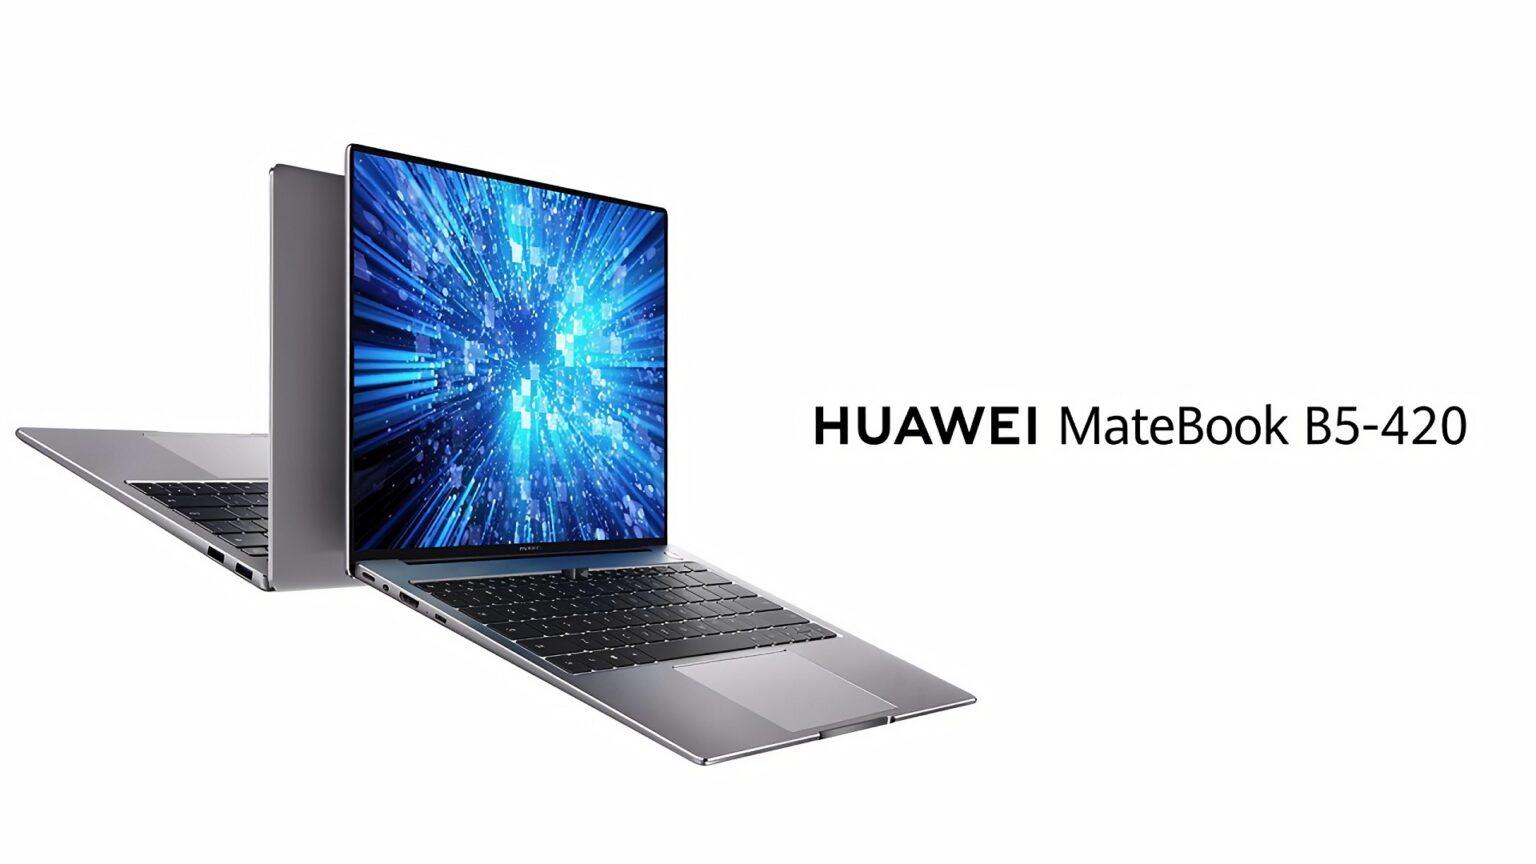 haceb.net...شركة Huawei تطلق أجهزة MateBook B المصممة من أجل الأعمال! 2020